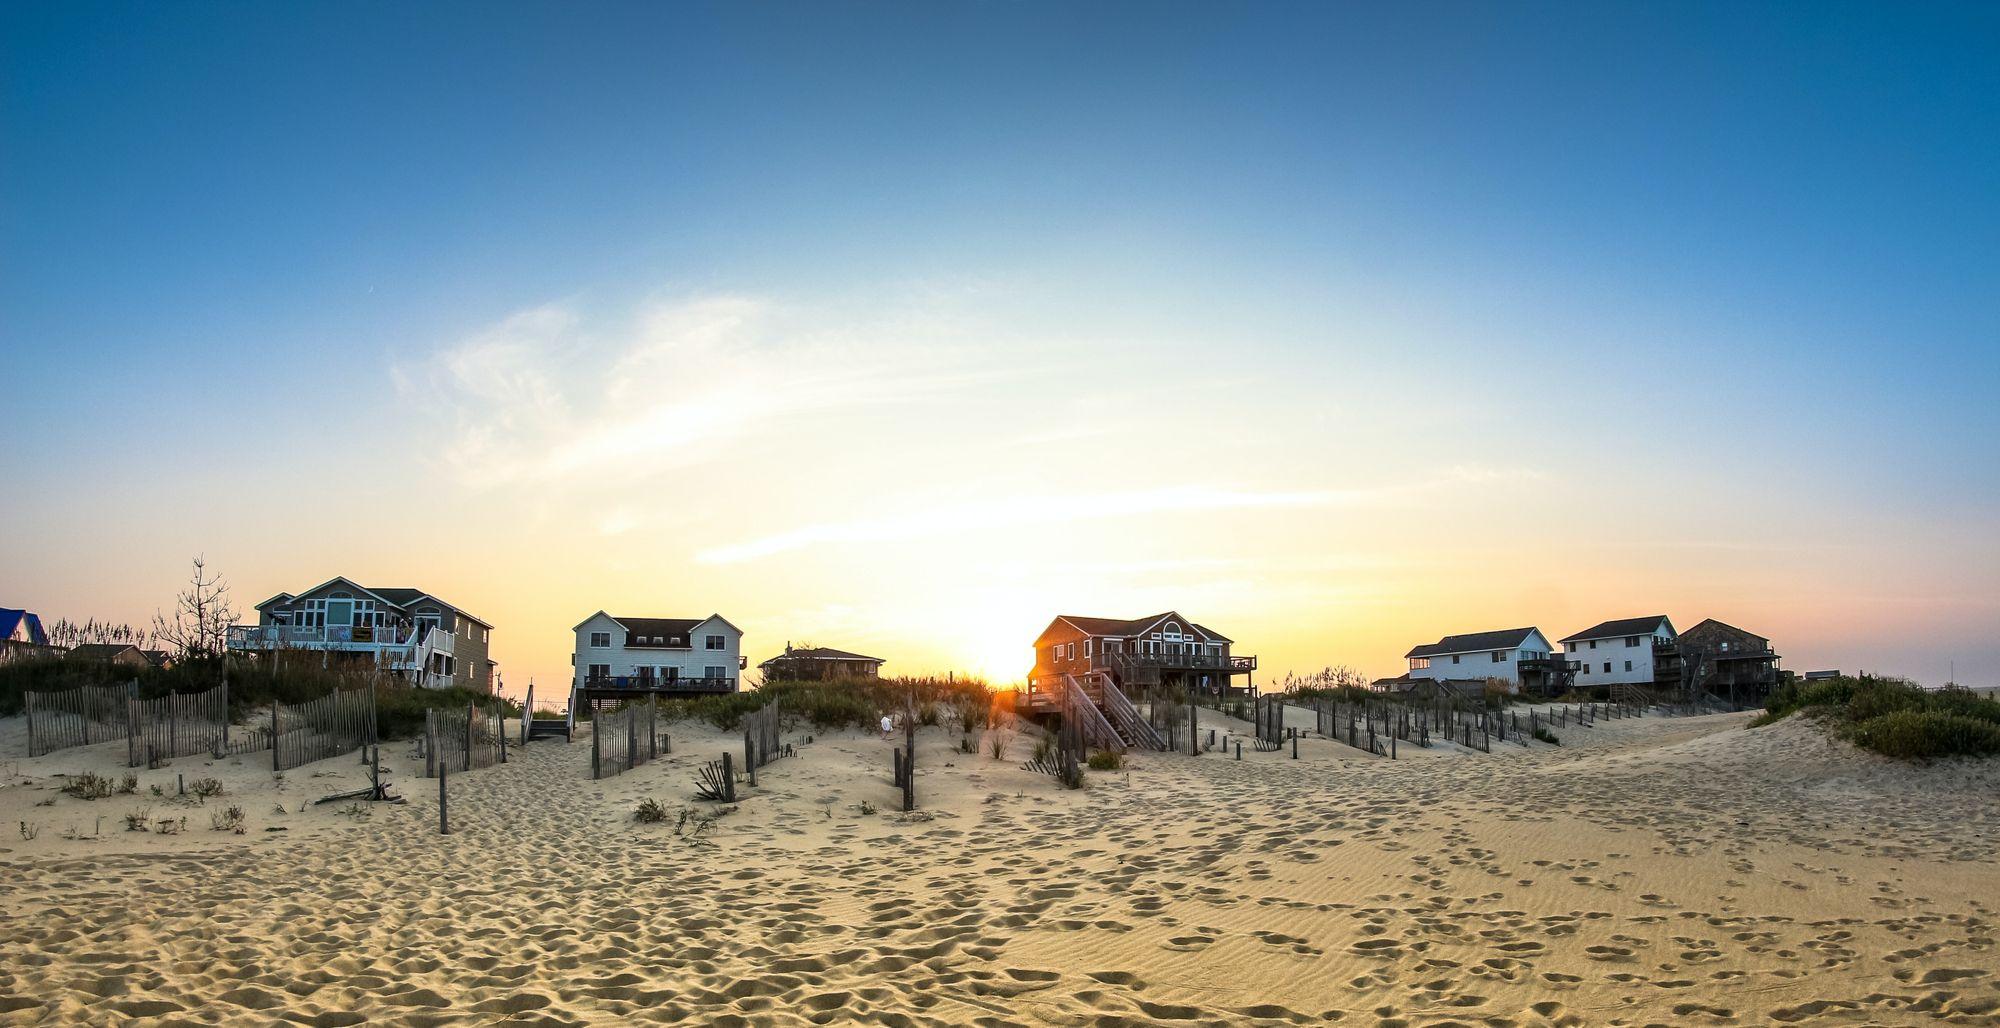 Beachfront in Nags Head, NC